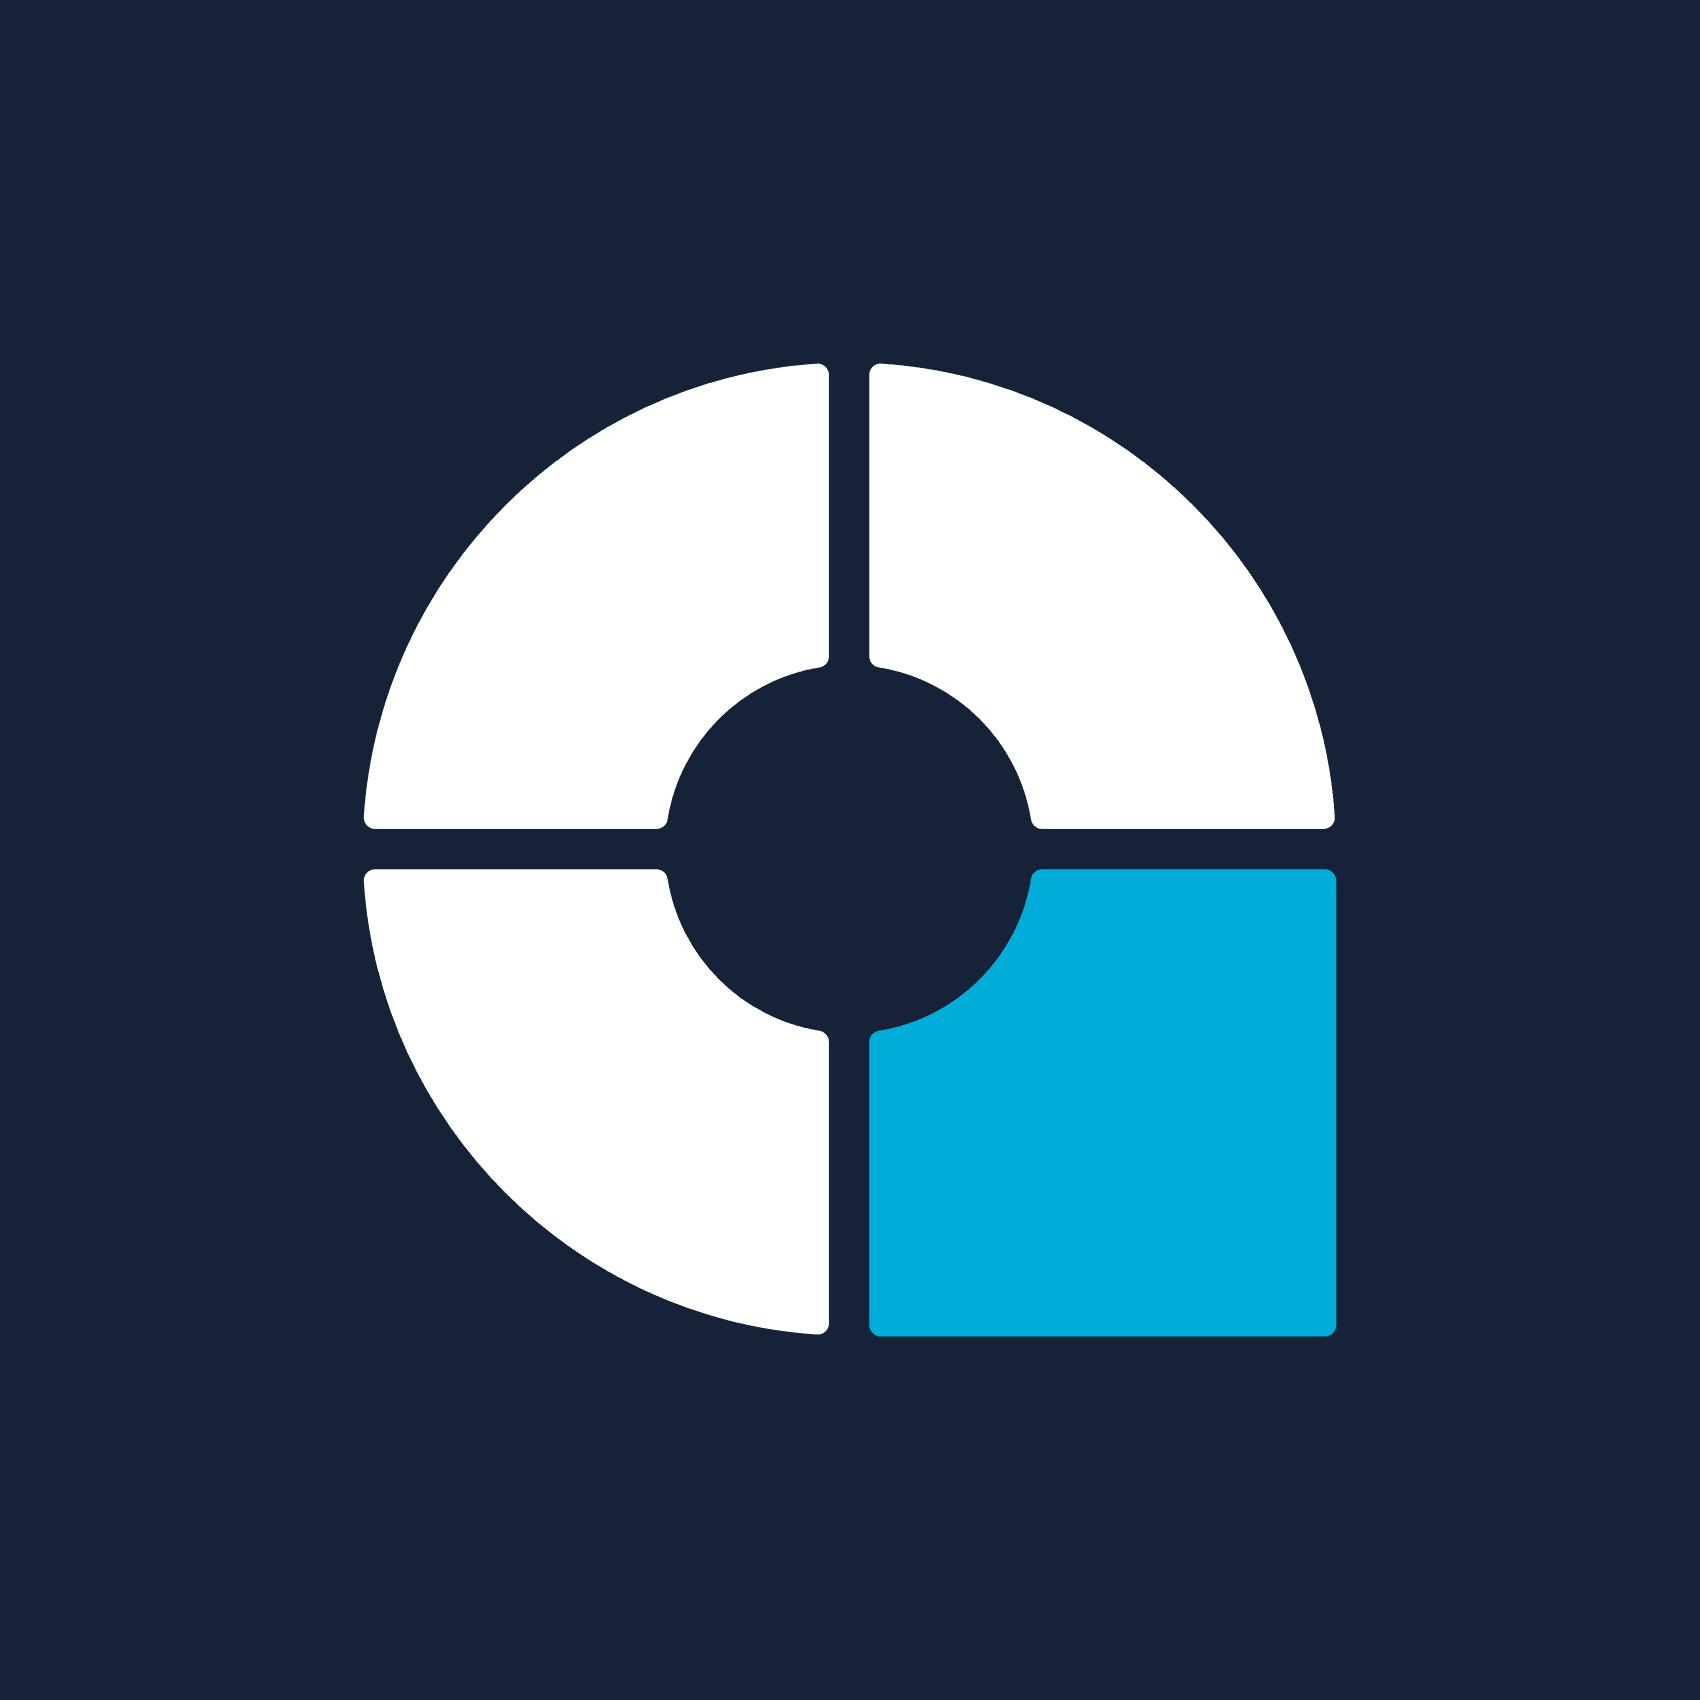 Quadrant brand identity